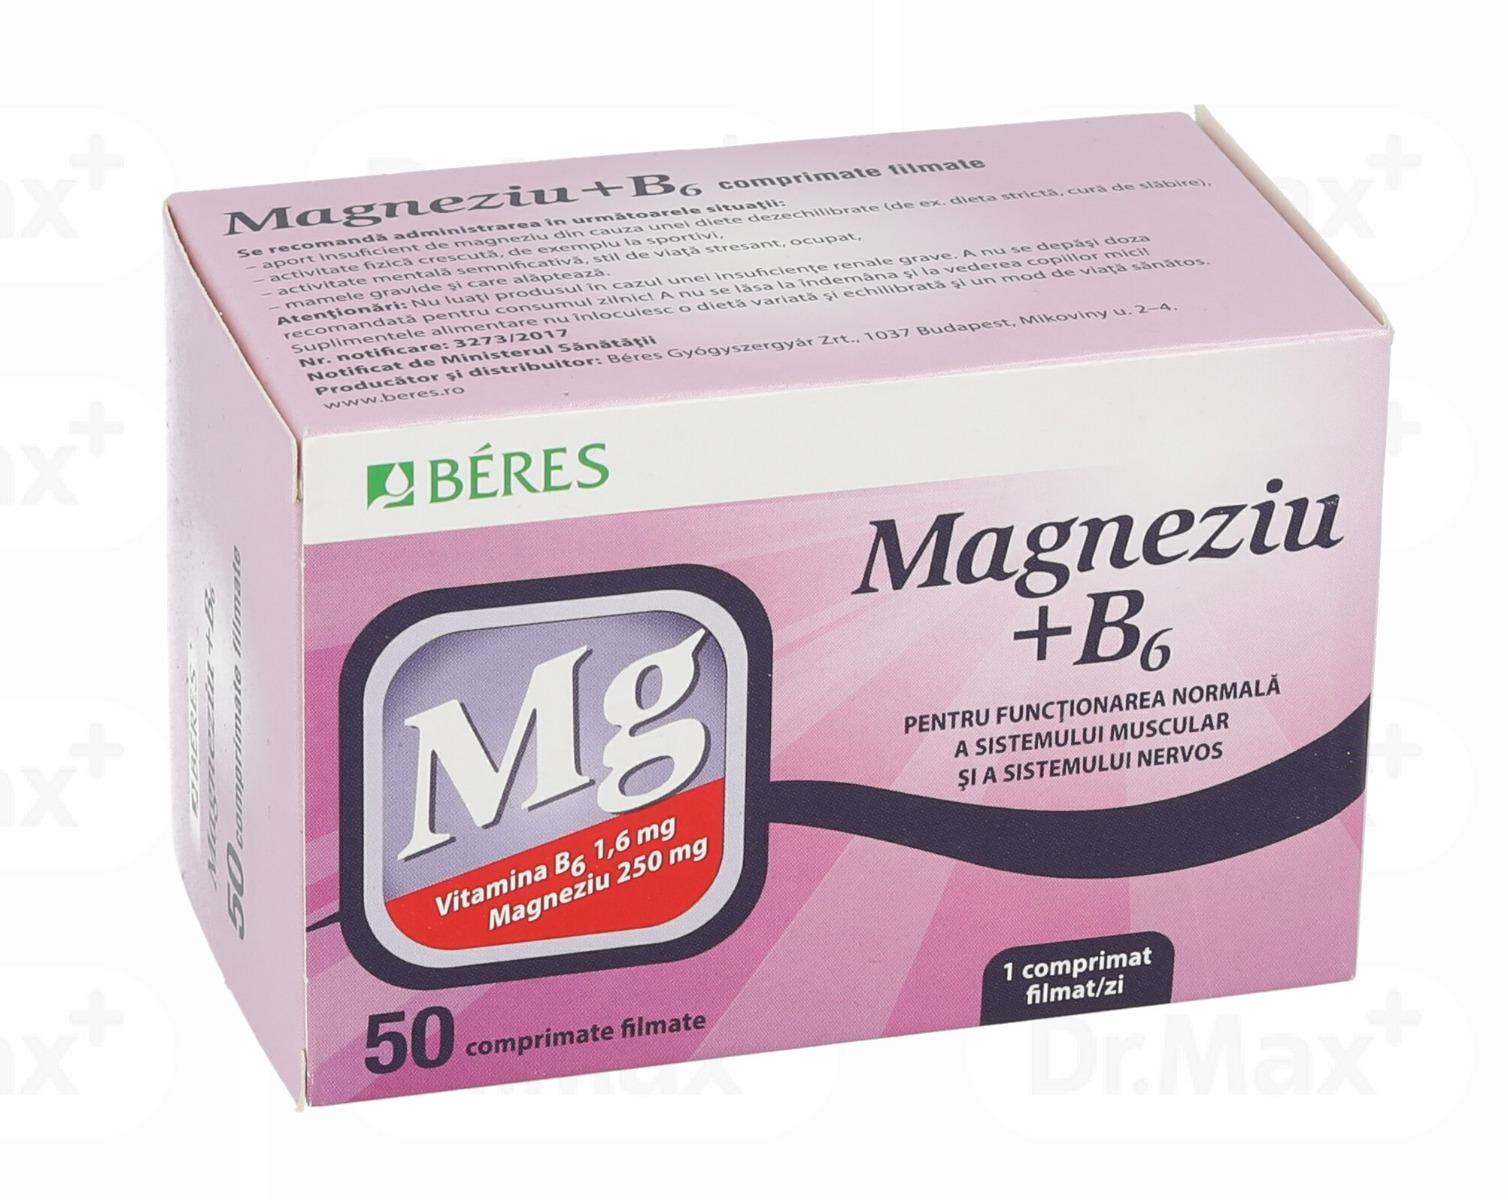 Magneziu + B6, 50 comprimate, Beres drmax.ro